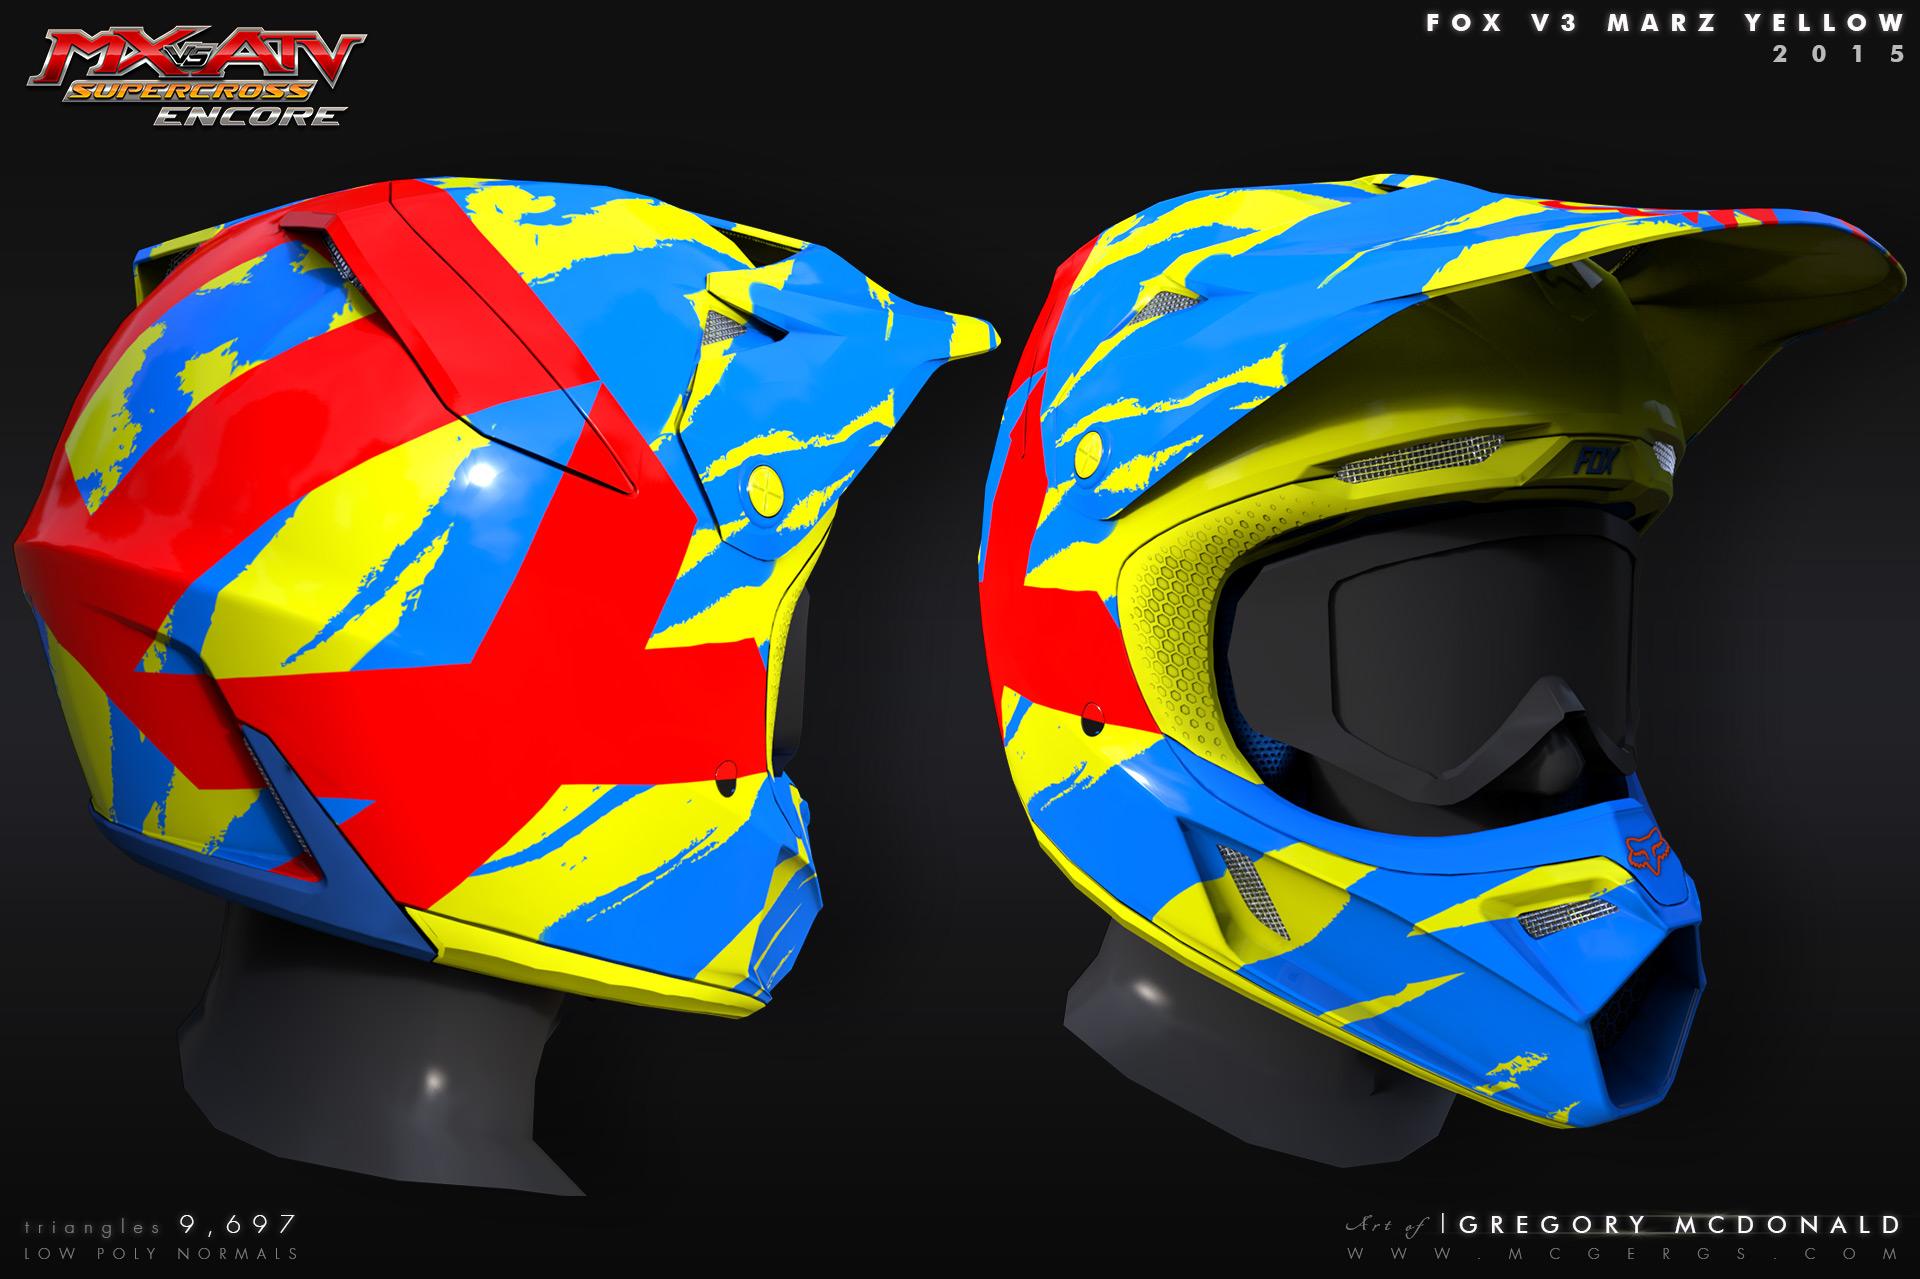 Helmet_FoxV3_Marz_Yellow